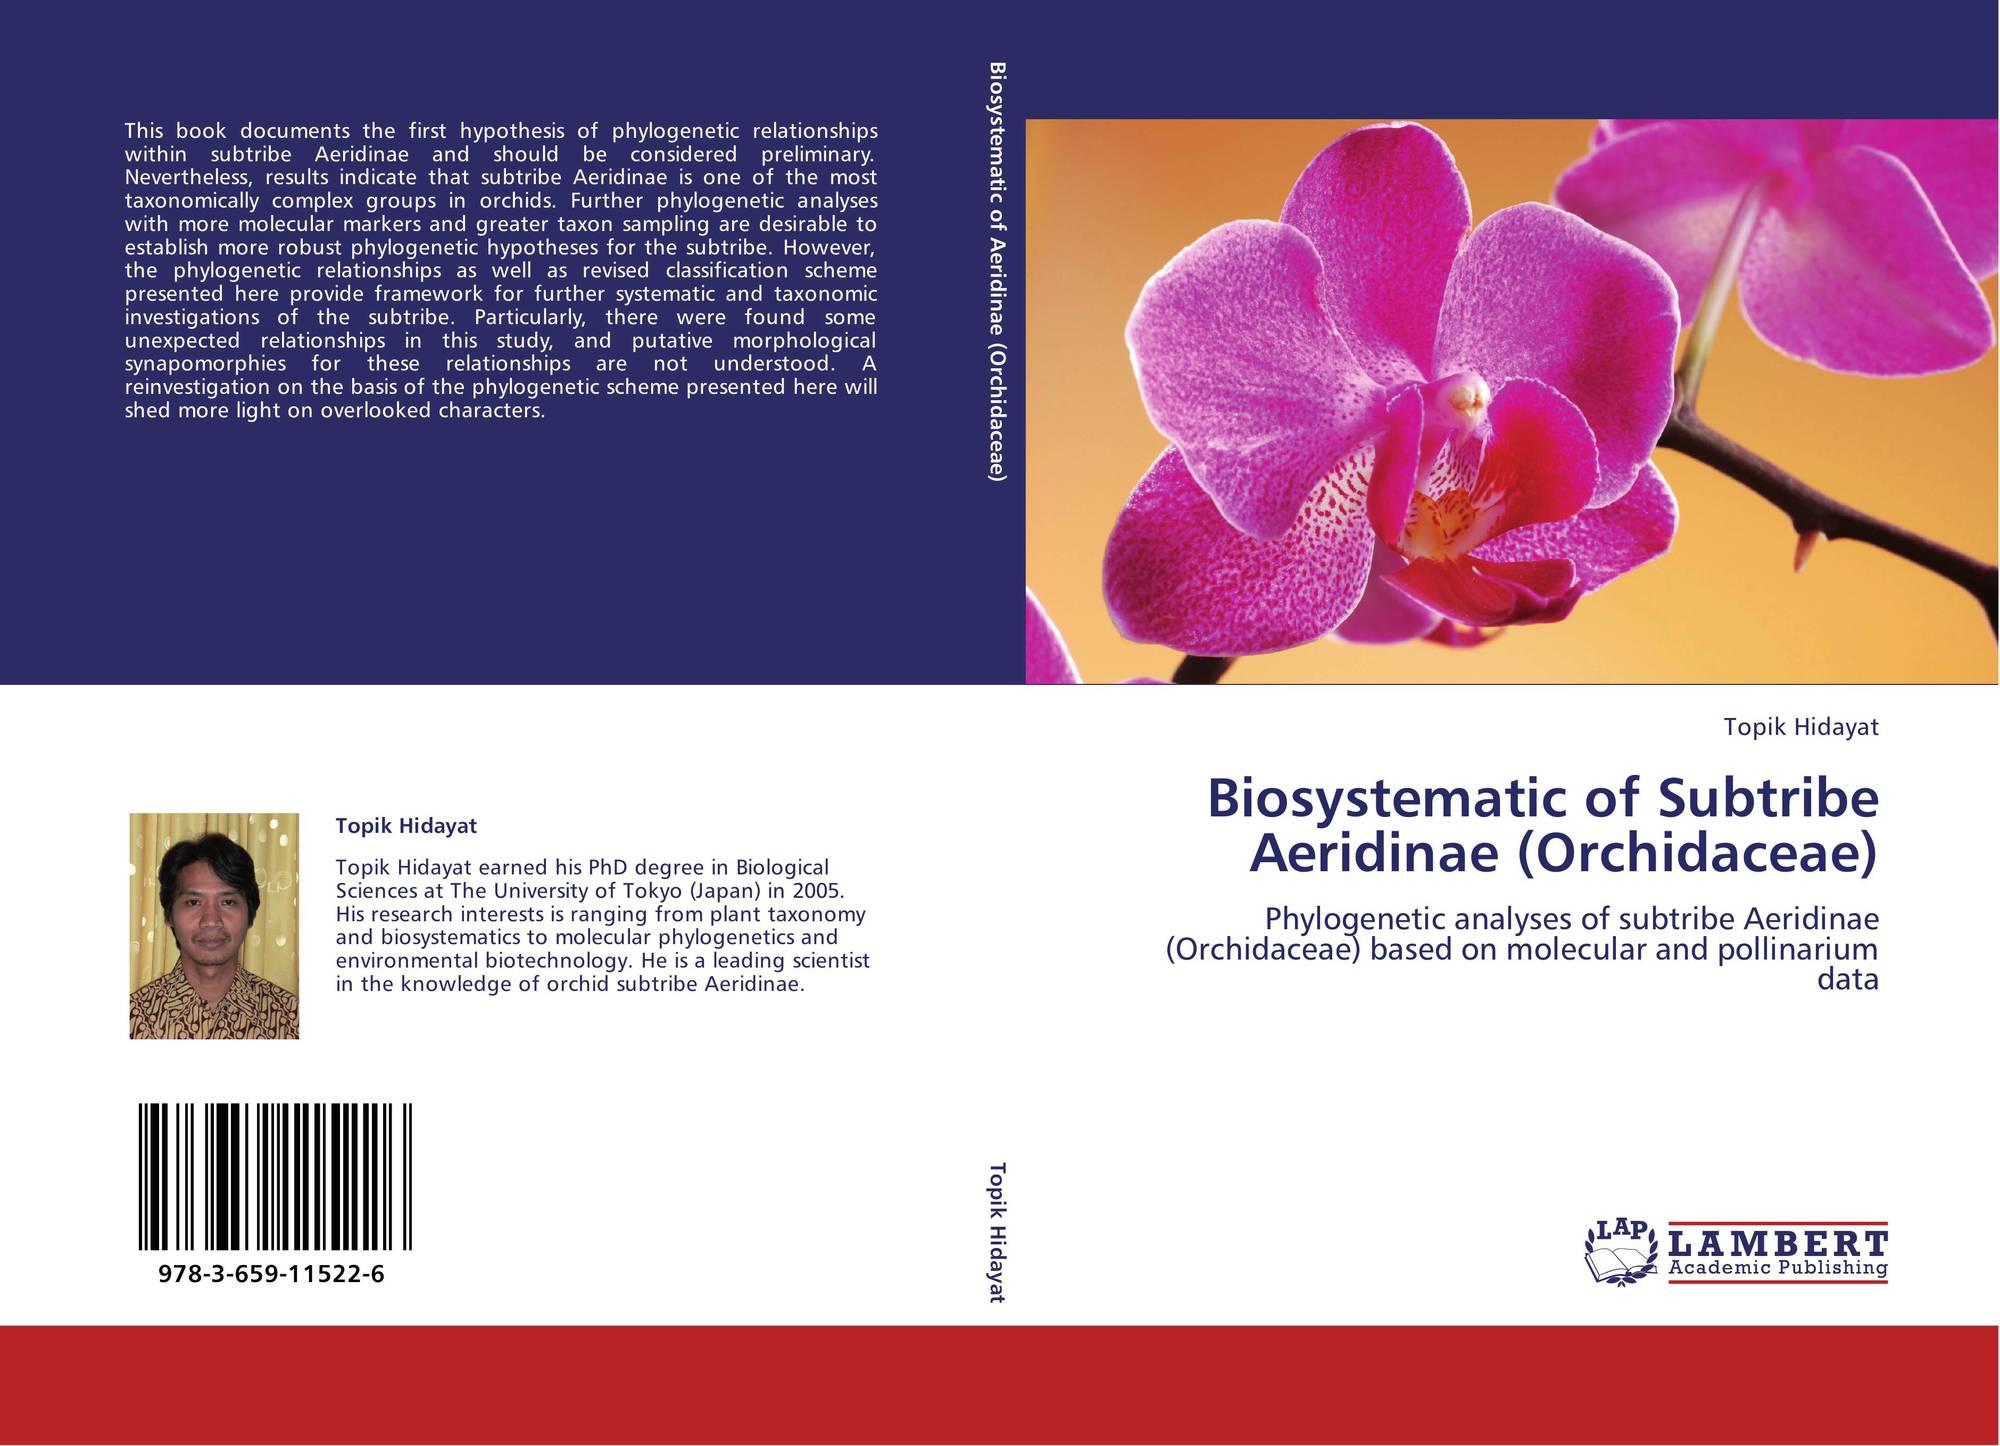 Biosystematic Of Subtribe Aeridinae Orchidaceae